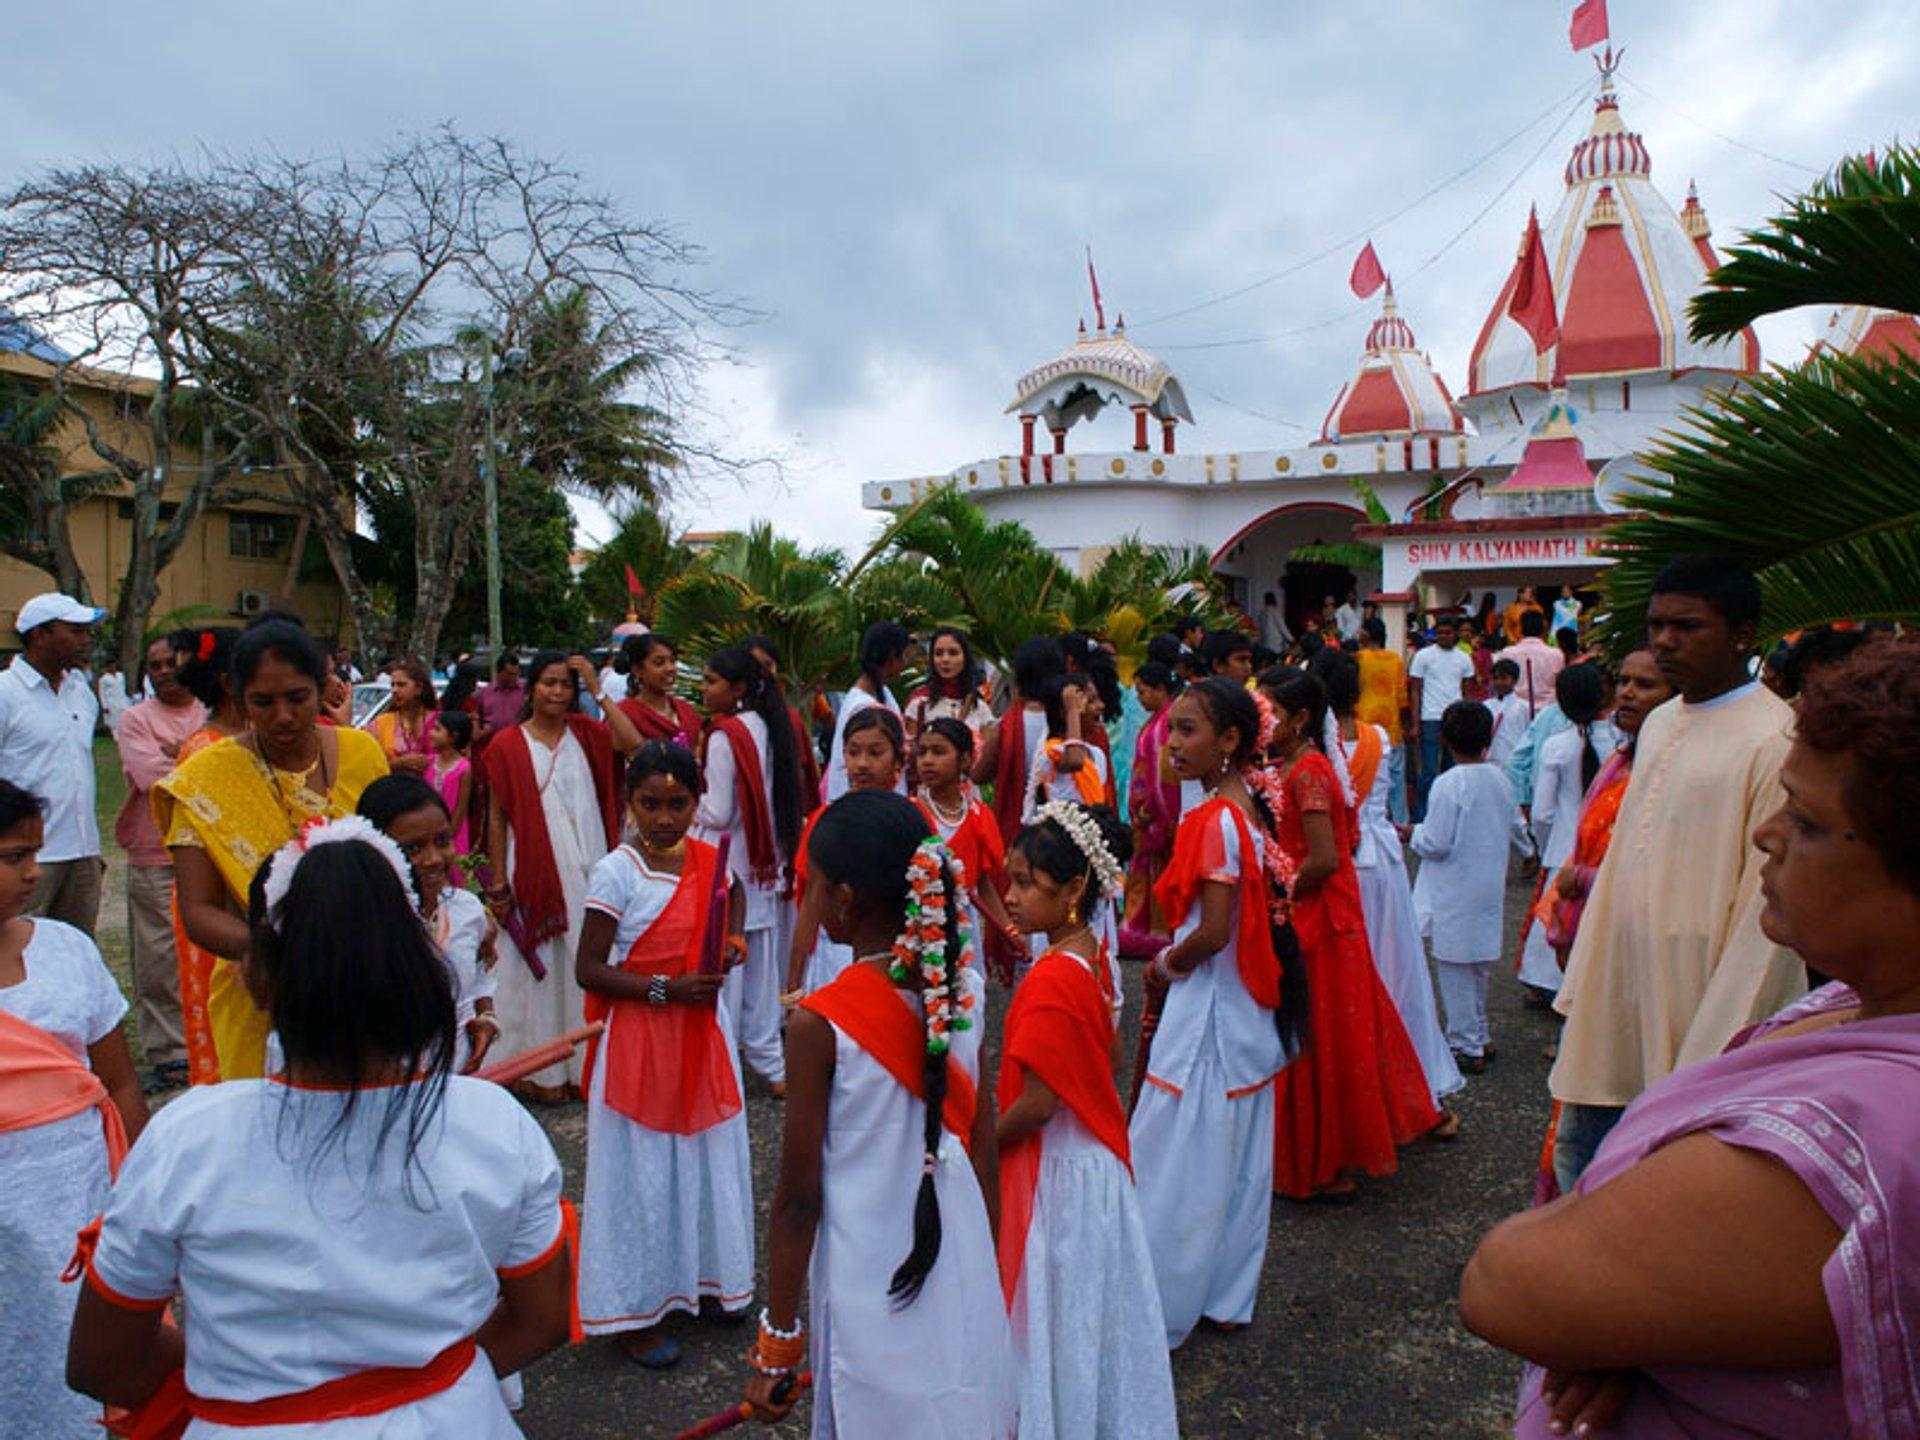 Shiv Kalyan Vath Mandir, Grand Baie, Mauritius 2020